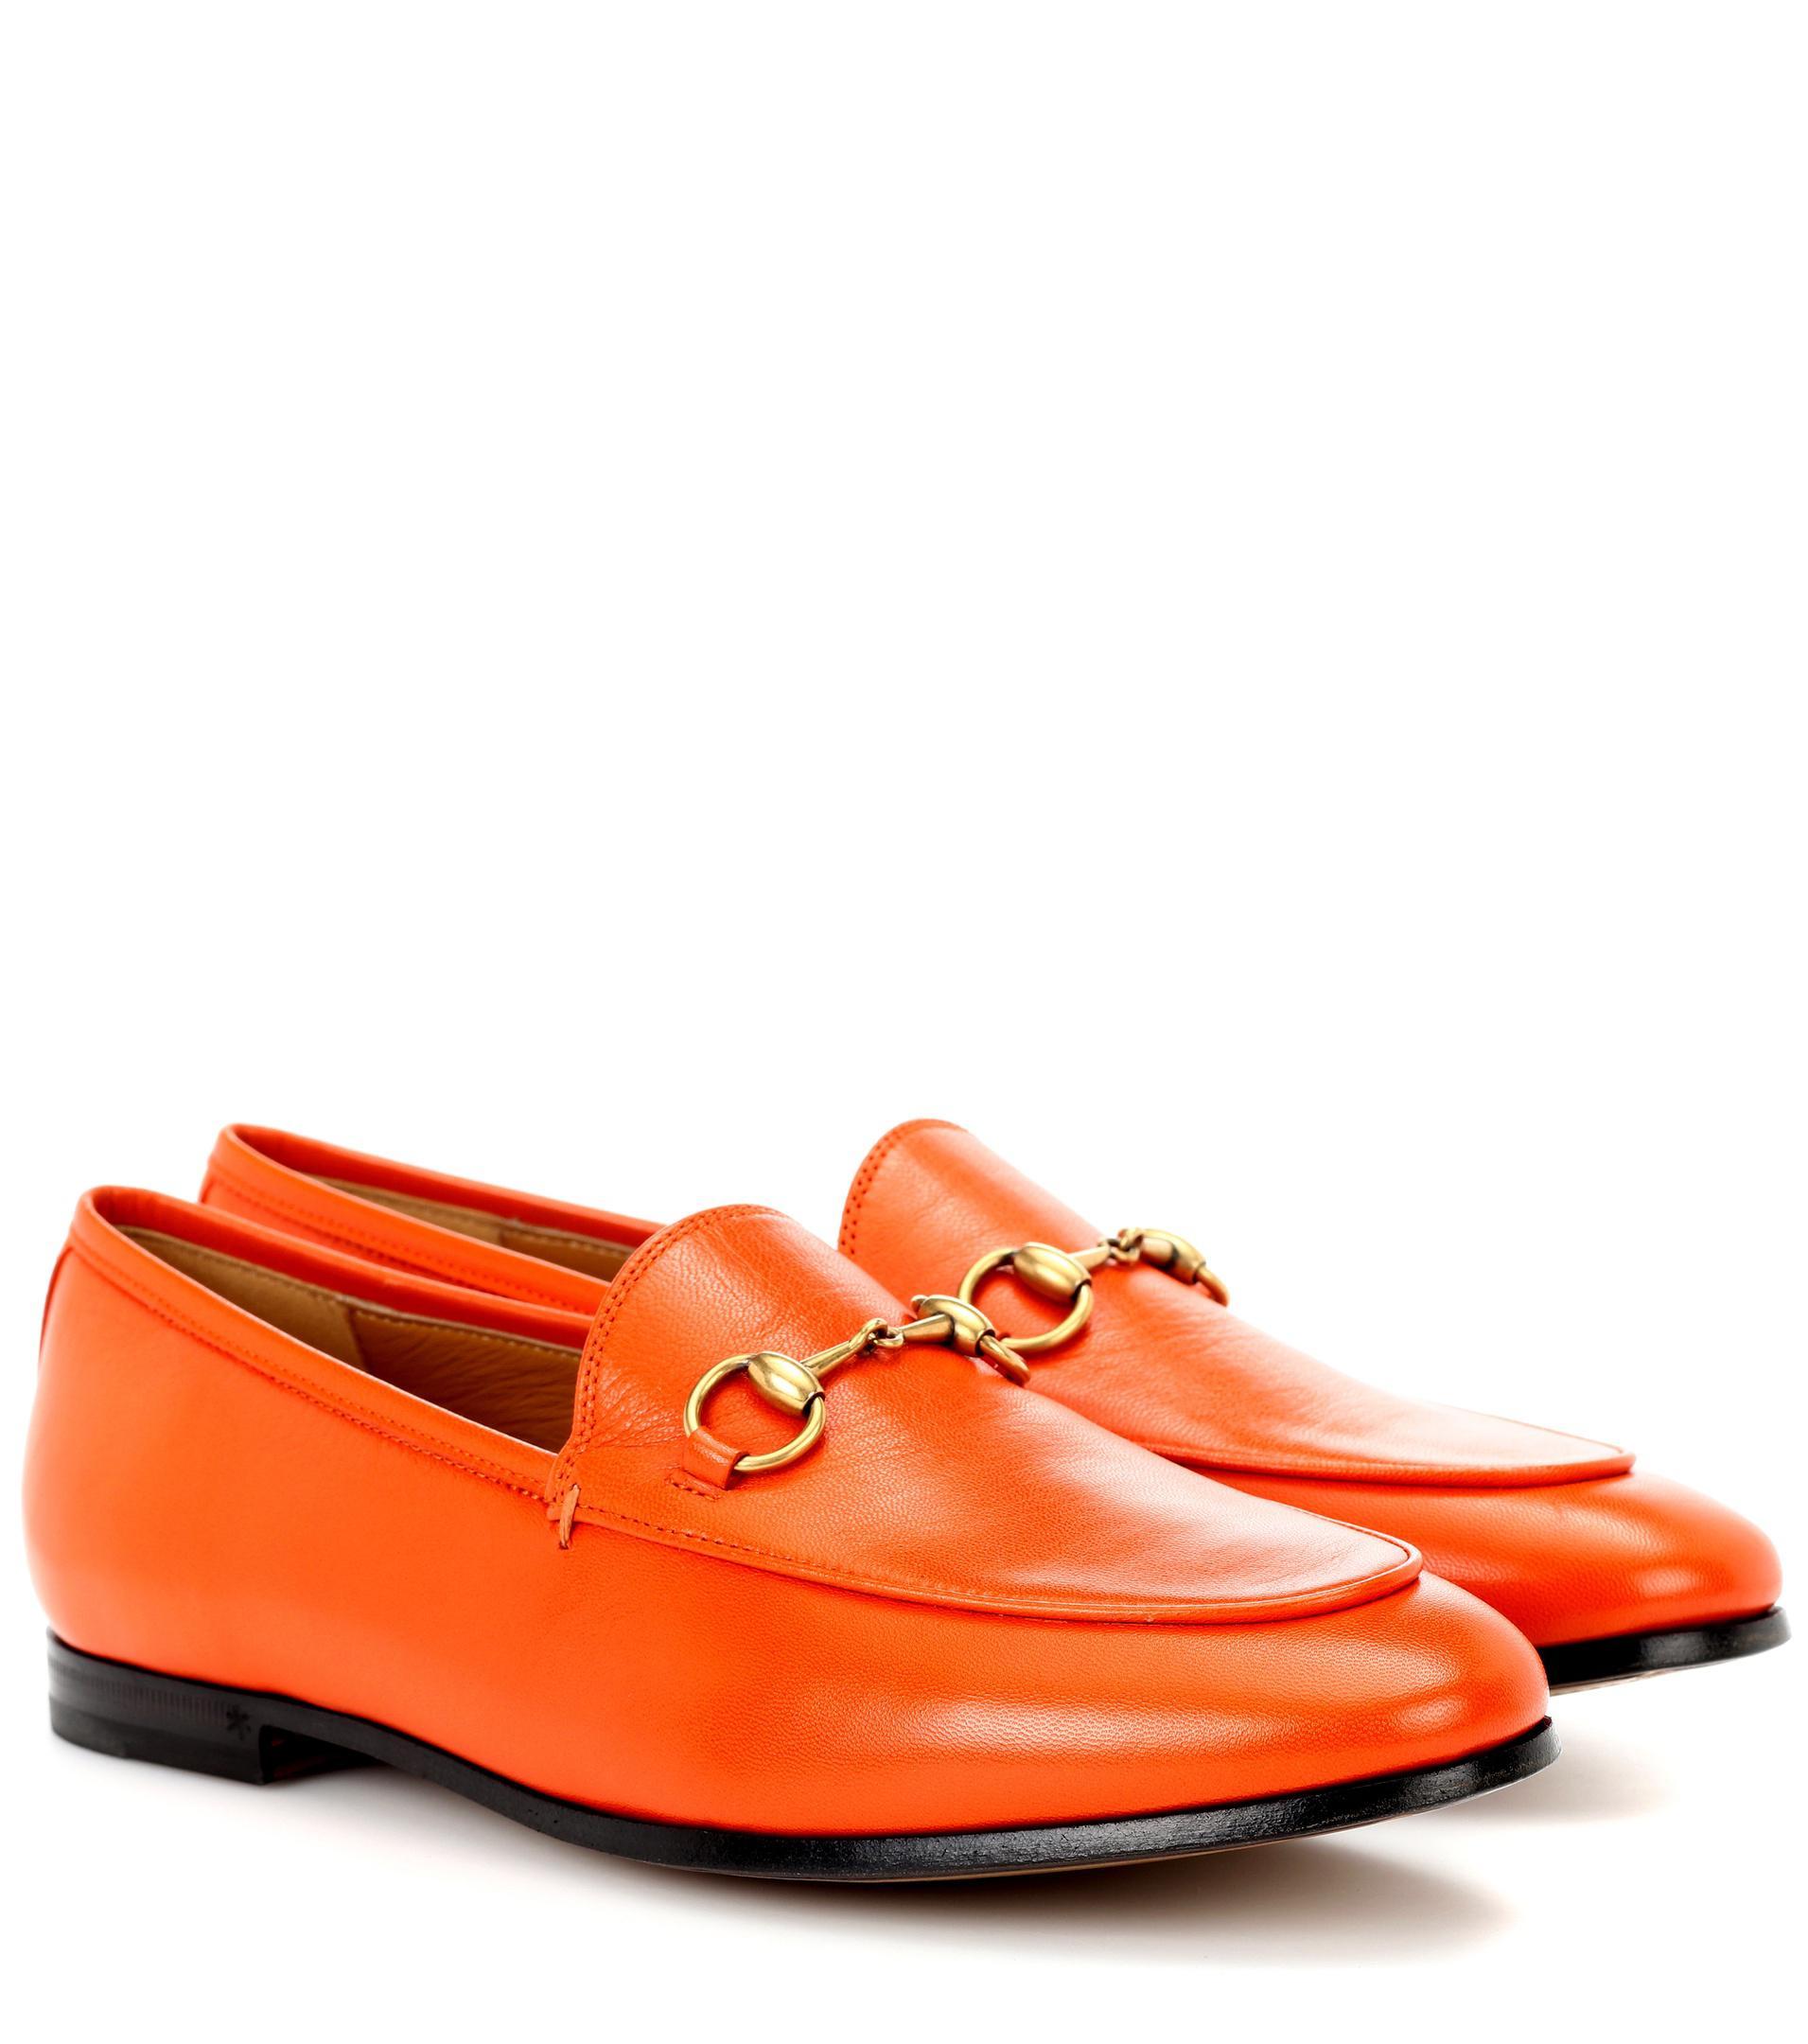 e4d9d64f2 Gucci Flat Jordaan Leather Loafer in Orange - Lyst